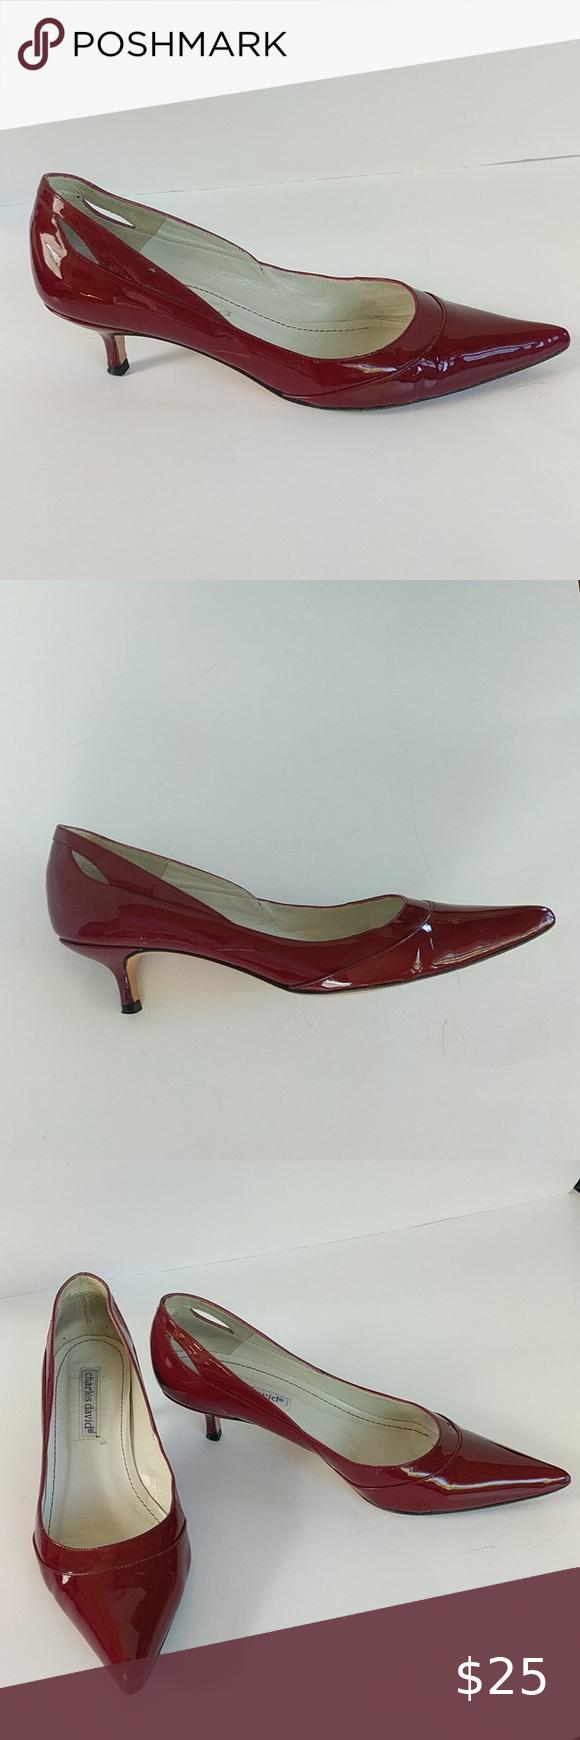 Charles David Patent Leather Kitten Heels Size 7 In 2020 Kitten Heels Shoes Women Heels Charles David Shoes